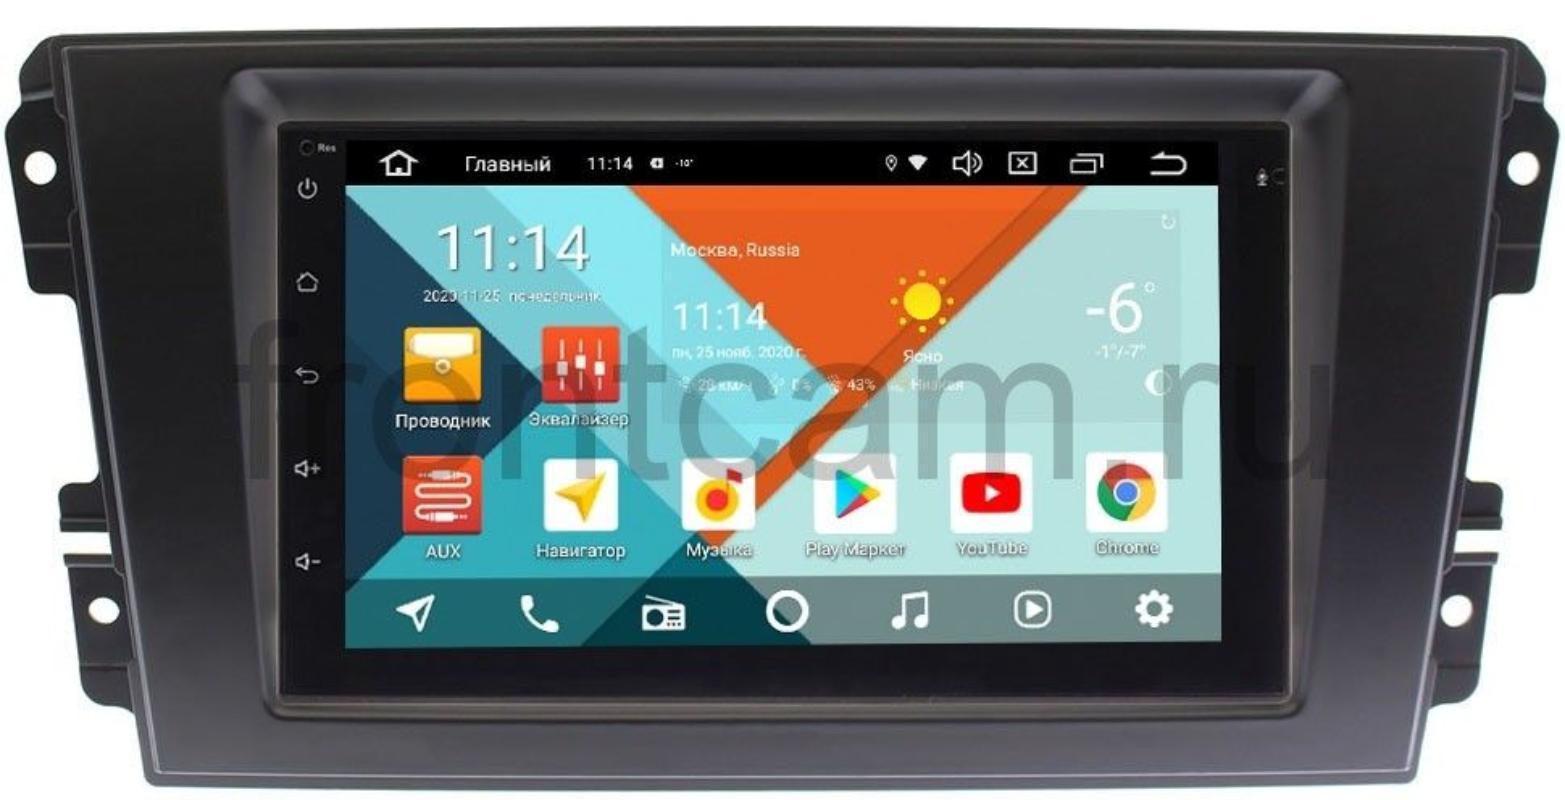 Магнитола в штатное место 2 din Datsun On-Do, Mi-Do 2014-2019 Wide Media KS7001QR-3/32-RP-DTOD-95 на Android 10 (DSP CarPlay 4G-SIM) (+ Камера заднего вида в подарок!)